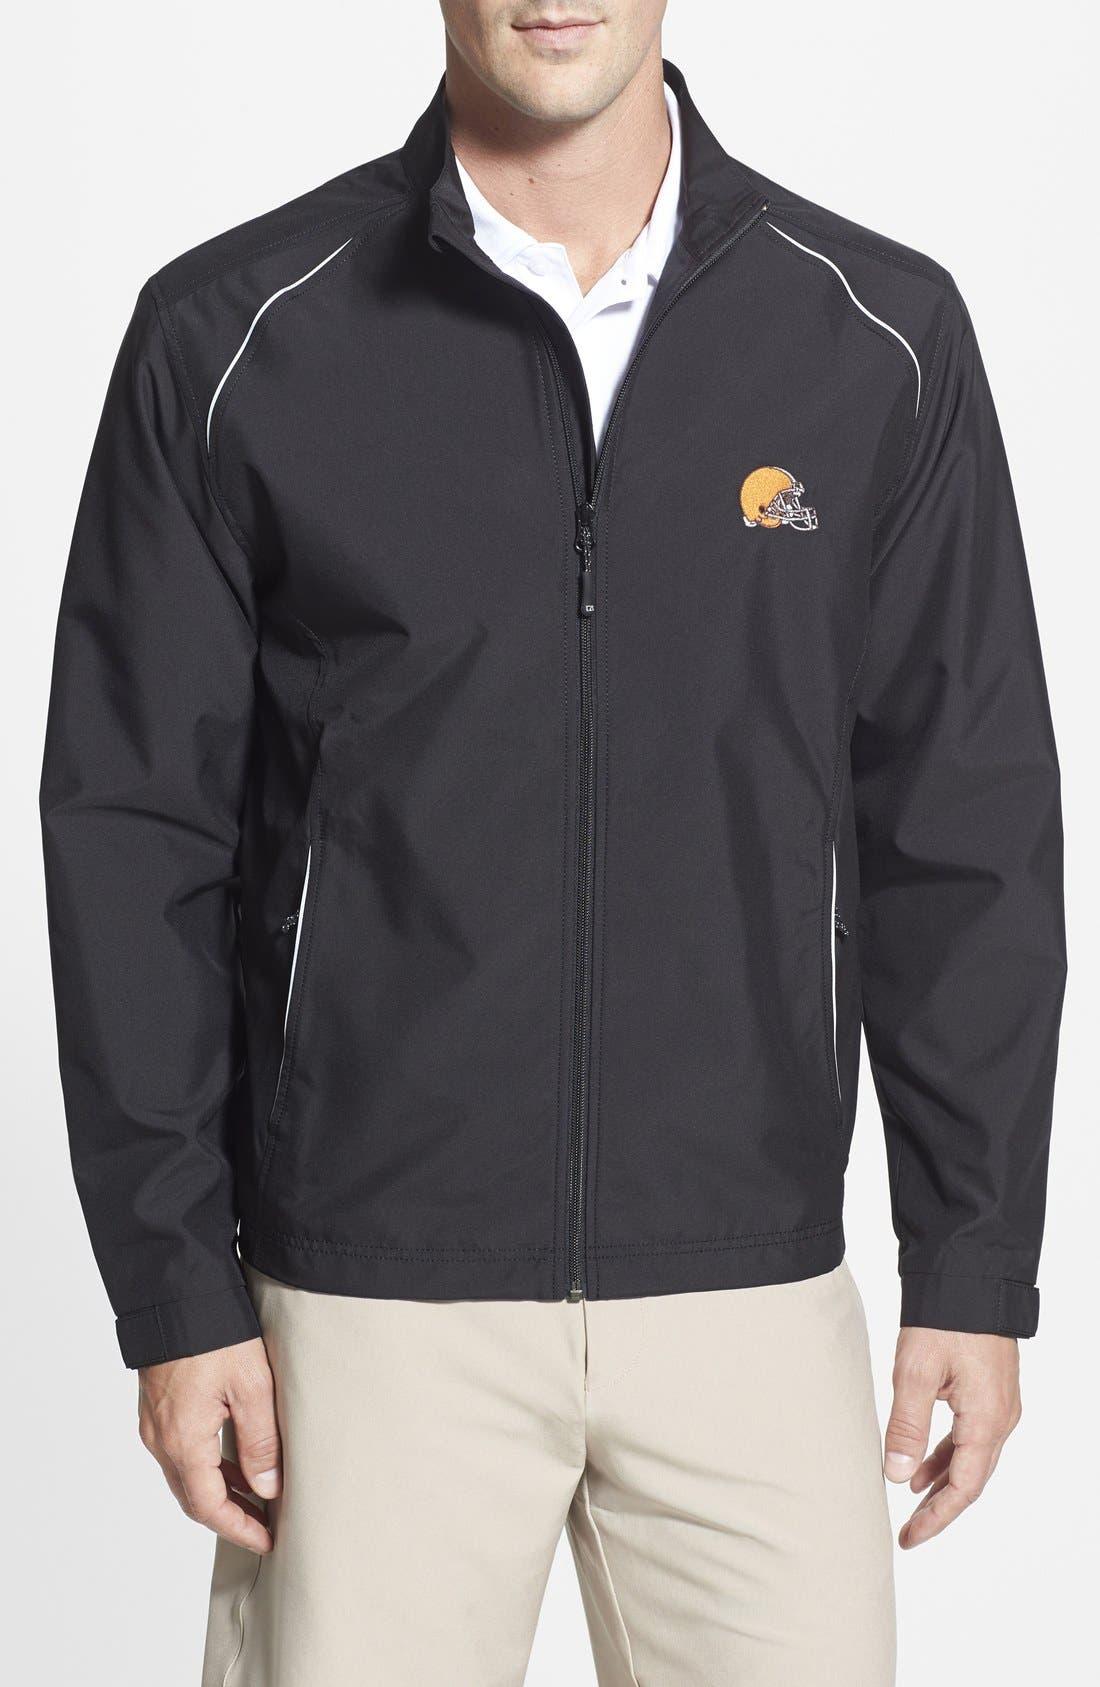 Cutter & Buck Cleveland Browns - Beacon WeatherTec Wind & Water Resistant Jacket